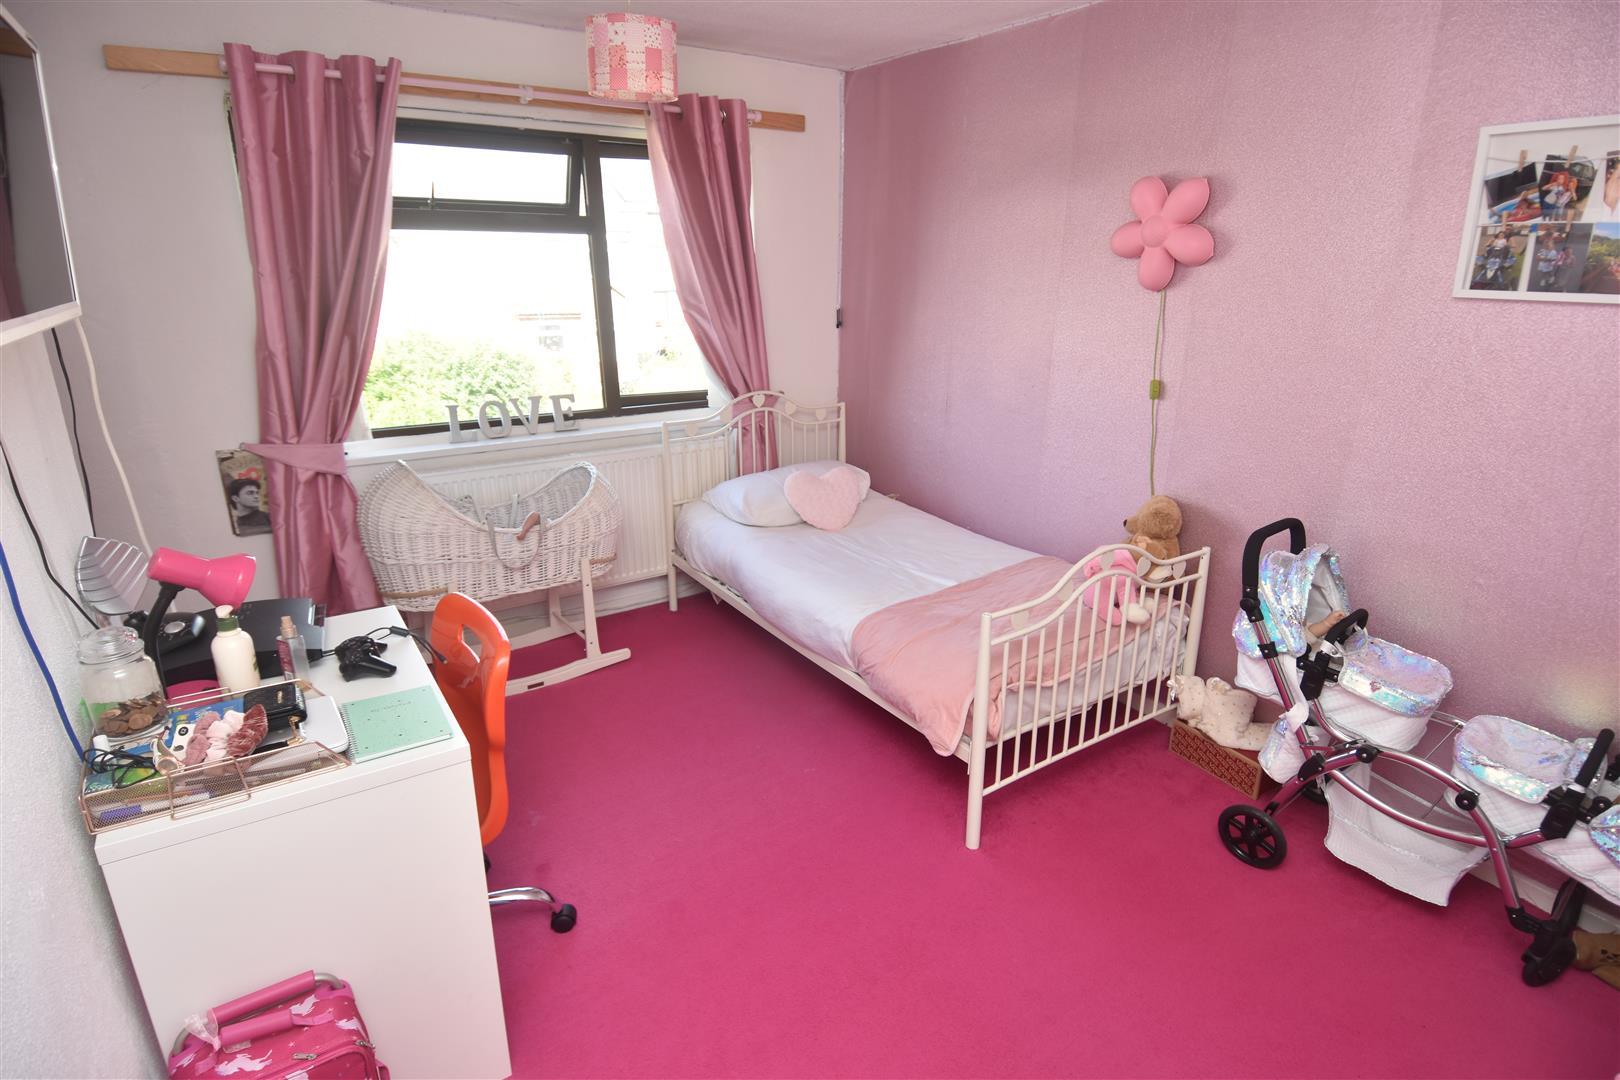 3 bed house for sale in Asholme Close, Bromford Bridge, Birmingham 7